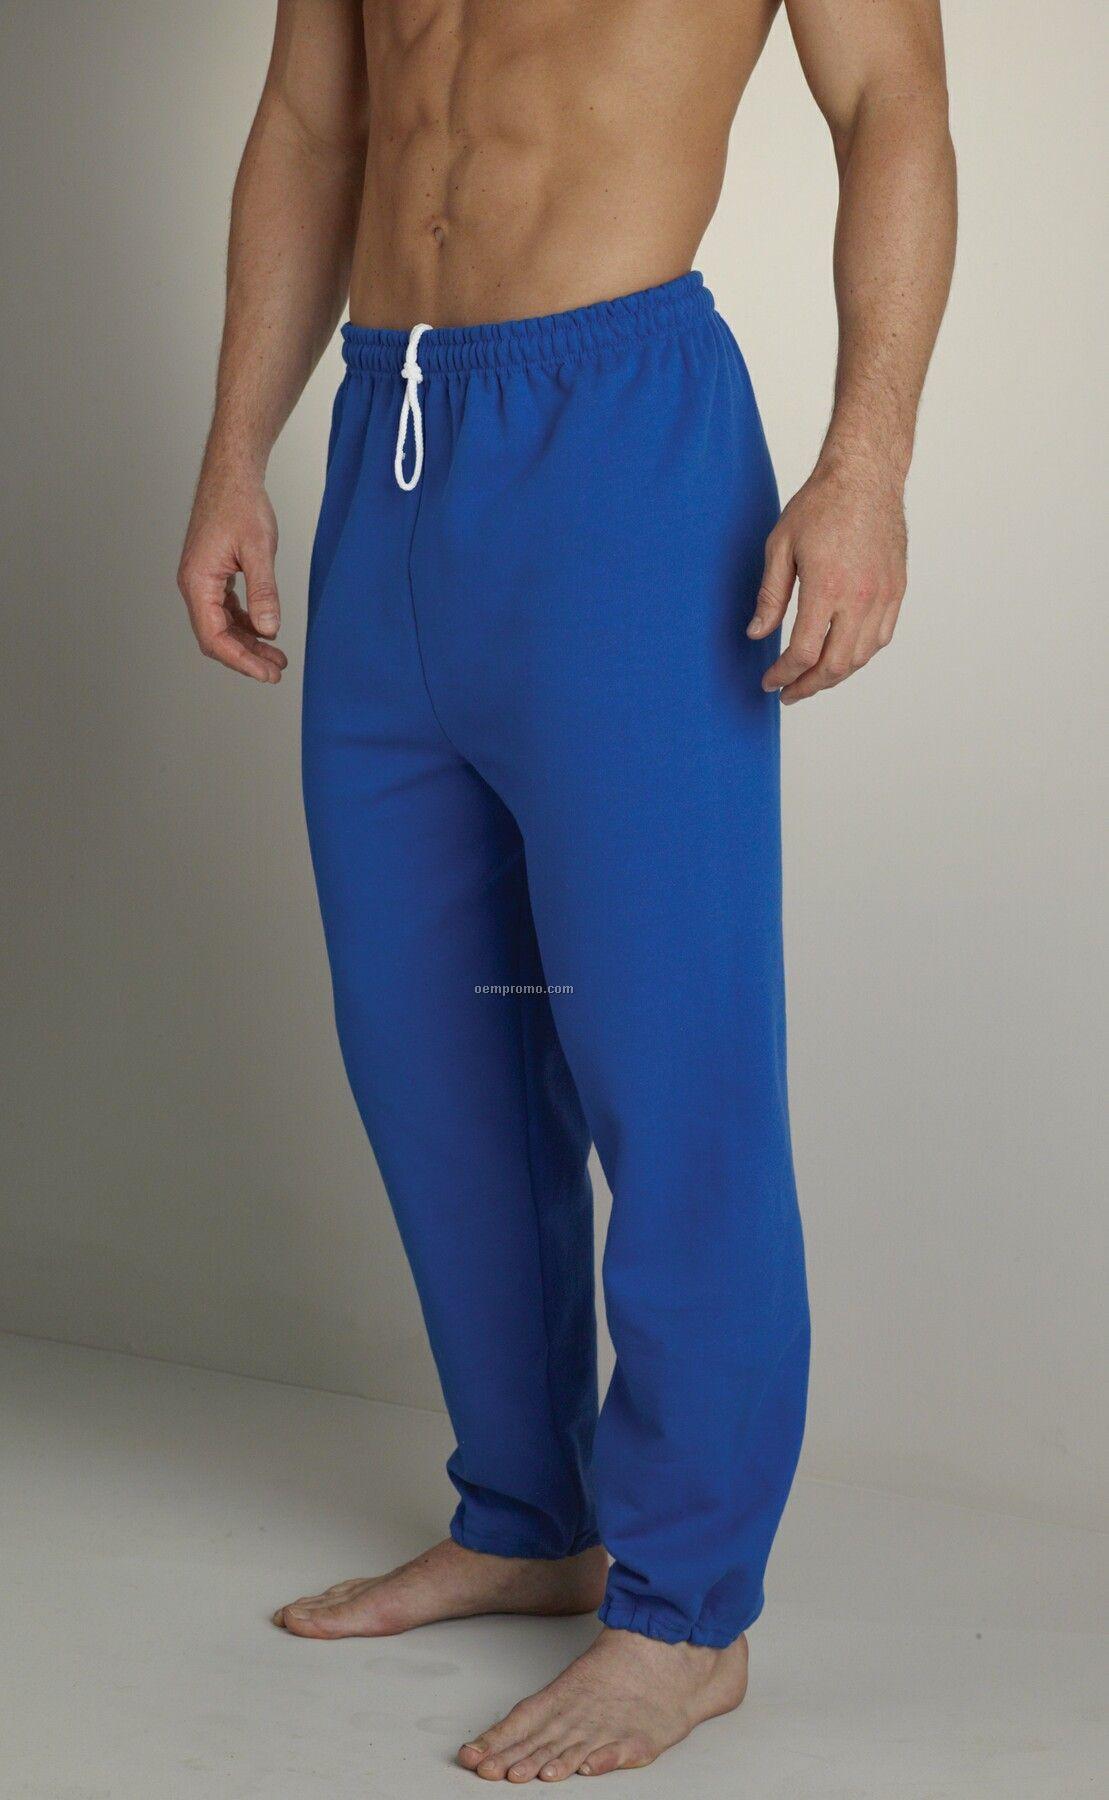 Gildan Heavy Blend Sweatpants - Colors